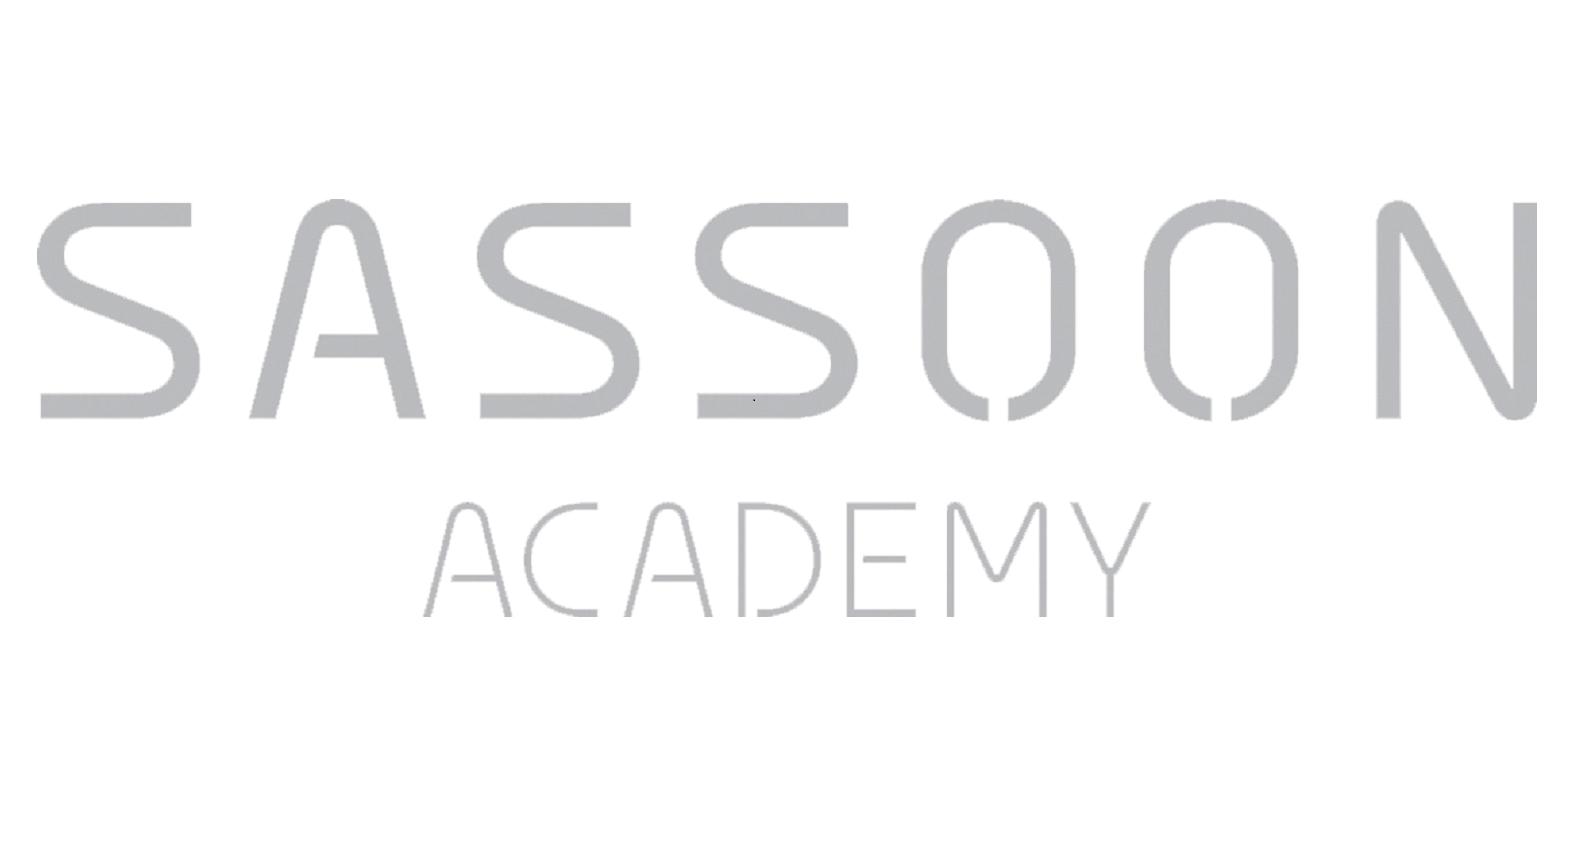 sassoon-academy2.png